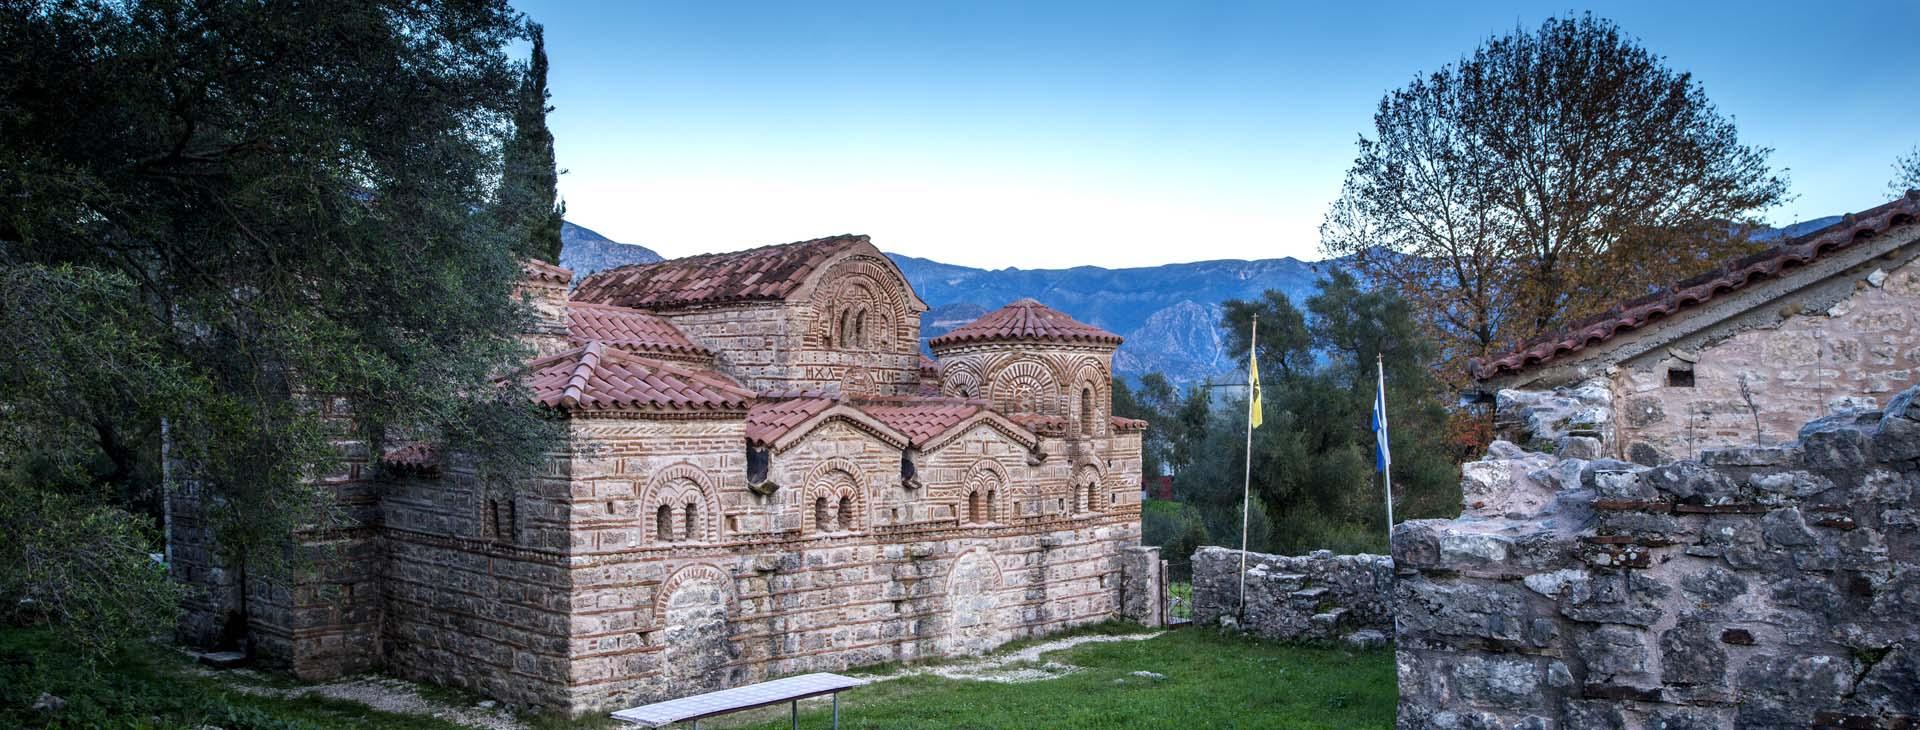 Monastery of Agios Dimitrios, Preveza